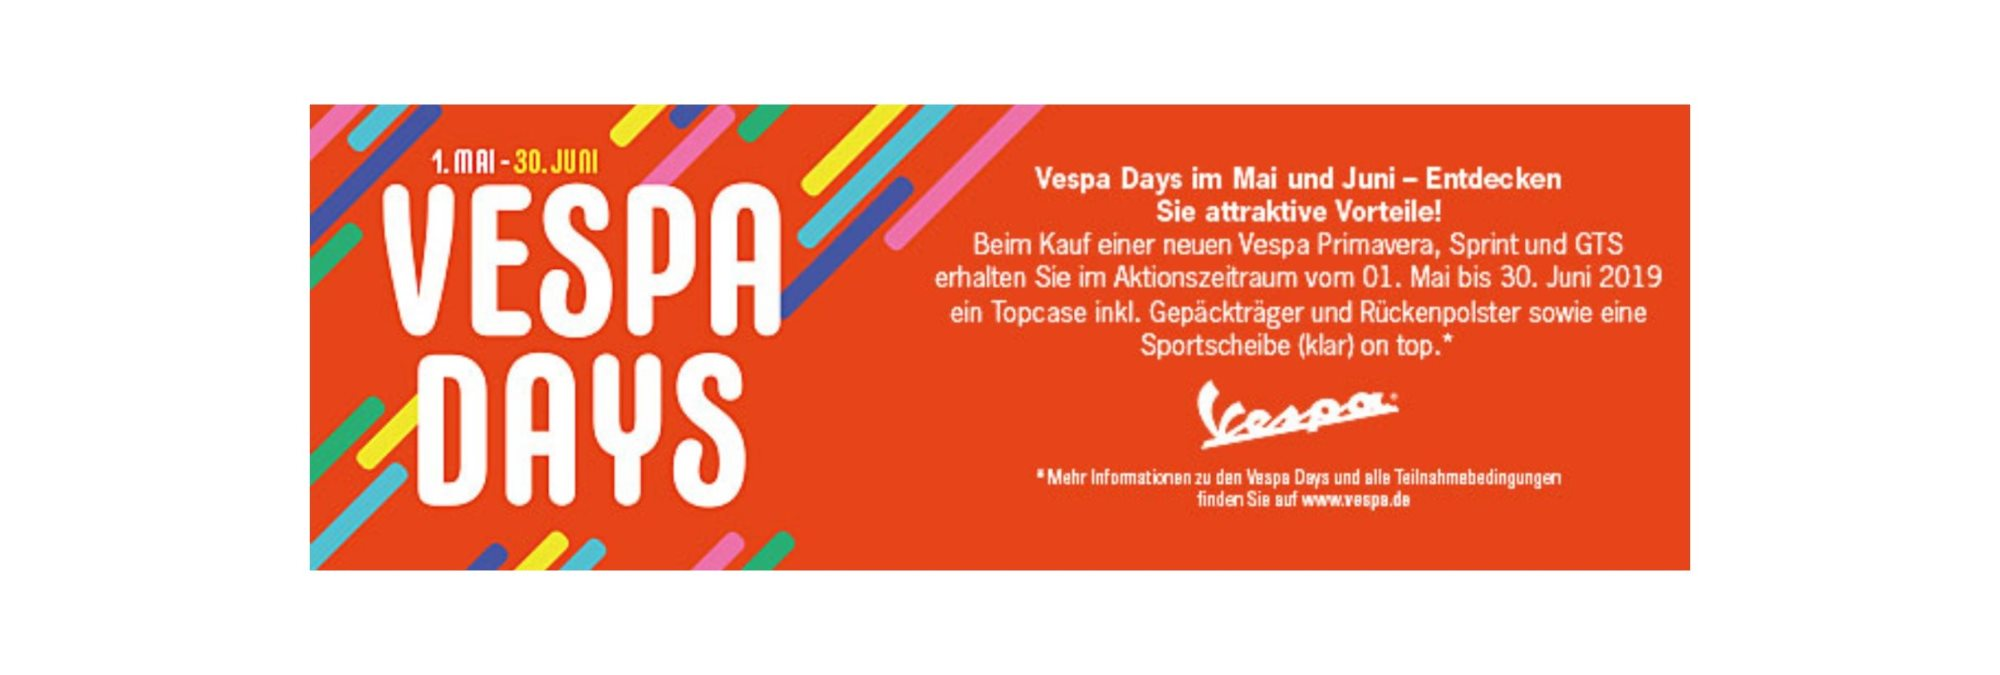 Vespa Days